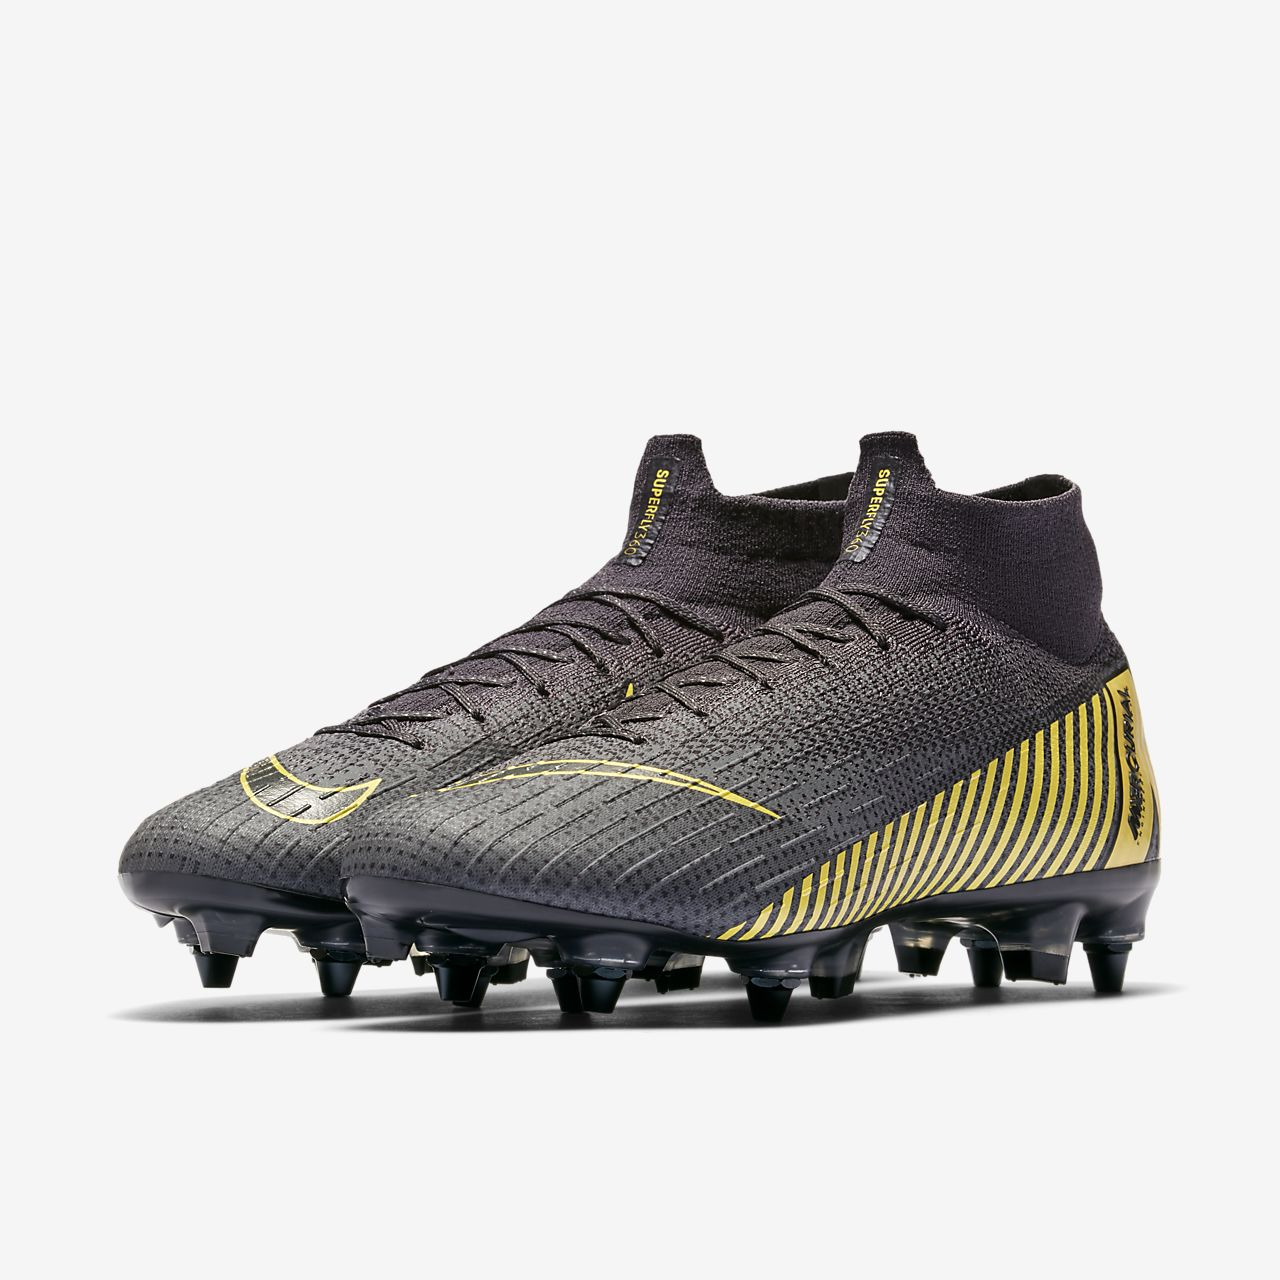 508f9e3f2549 ... Nike Mercurial Superfly 360 Elite SG-PRO Anti-Clog Soft-Ground Football  Boot